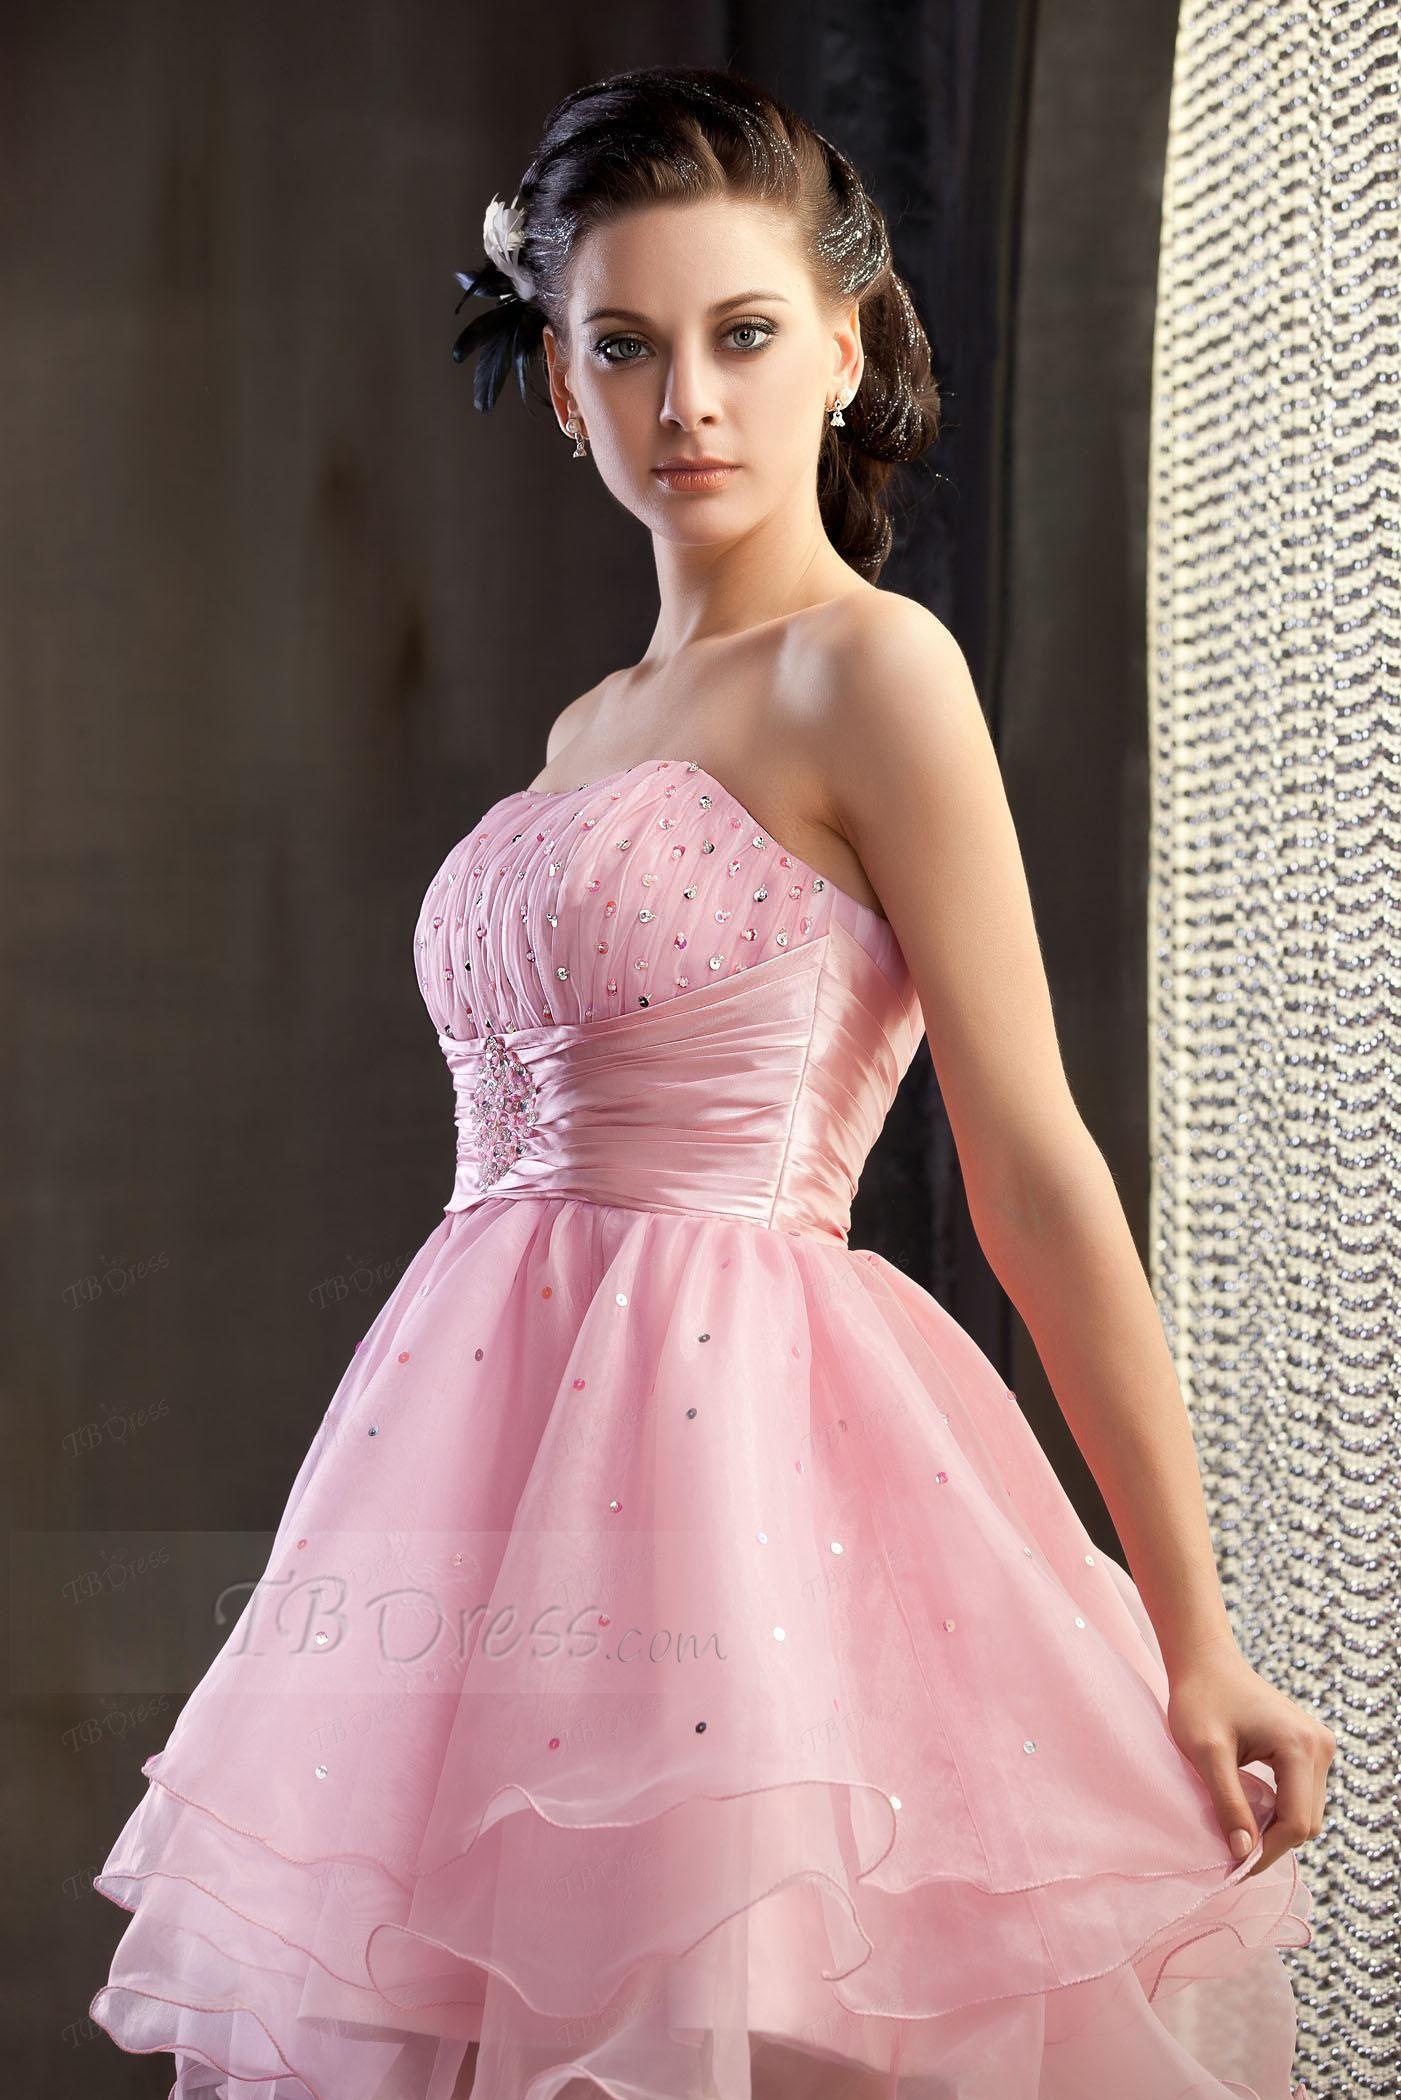 Pin By Stacy Saienni Godwin On Short Sweet Sixteen Party Dresses Sweet Sixteen Dresses Dresses Elegant Dresses Short [ 2100 x 1401 Pixel ]